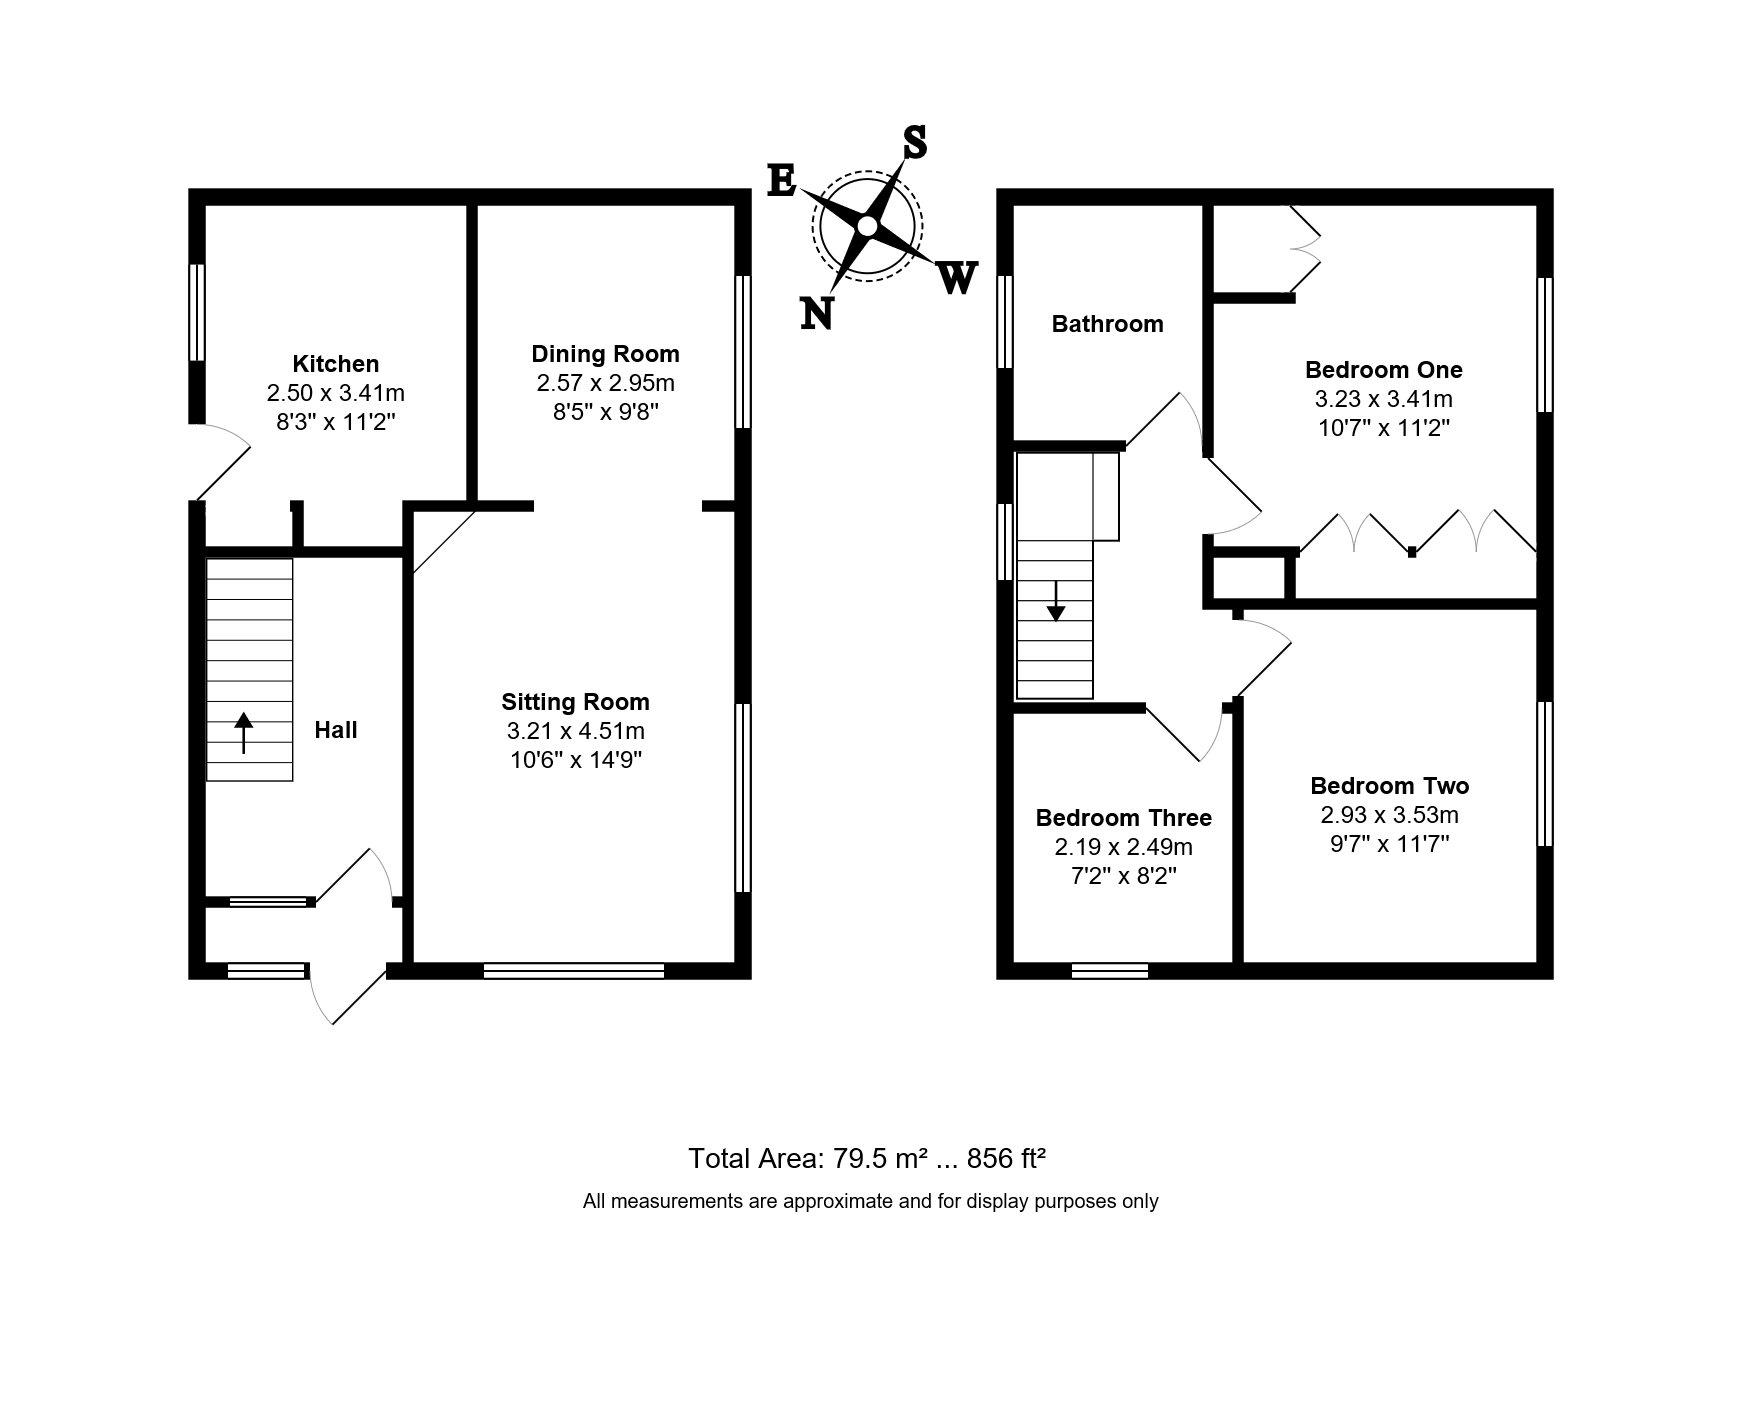 11 Kensington Close_floorplan (1).jpg